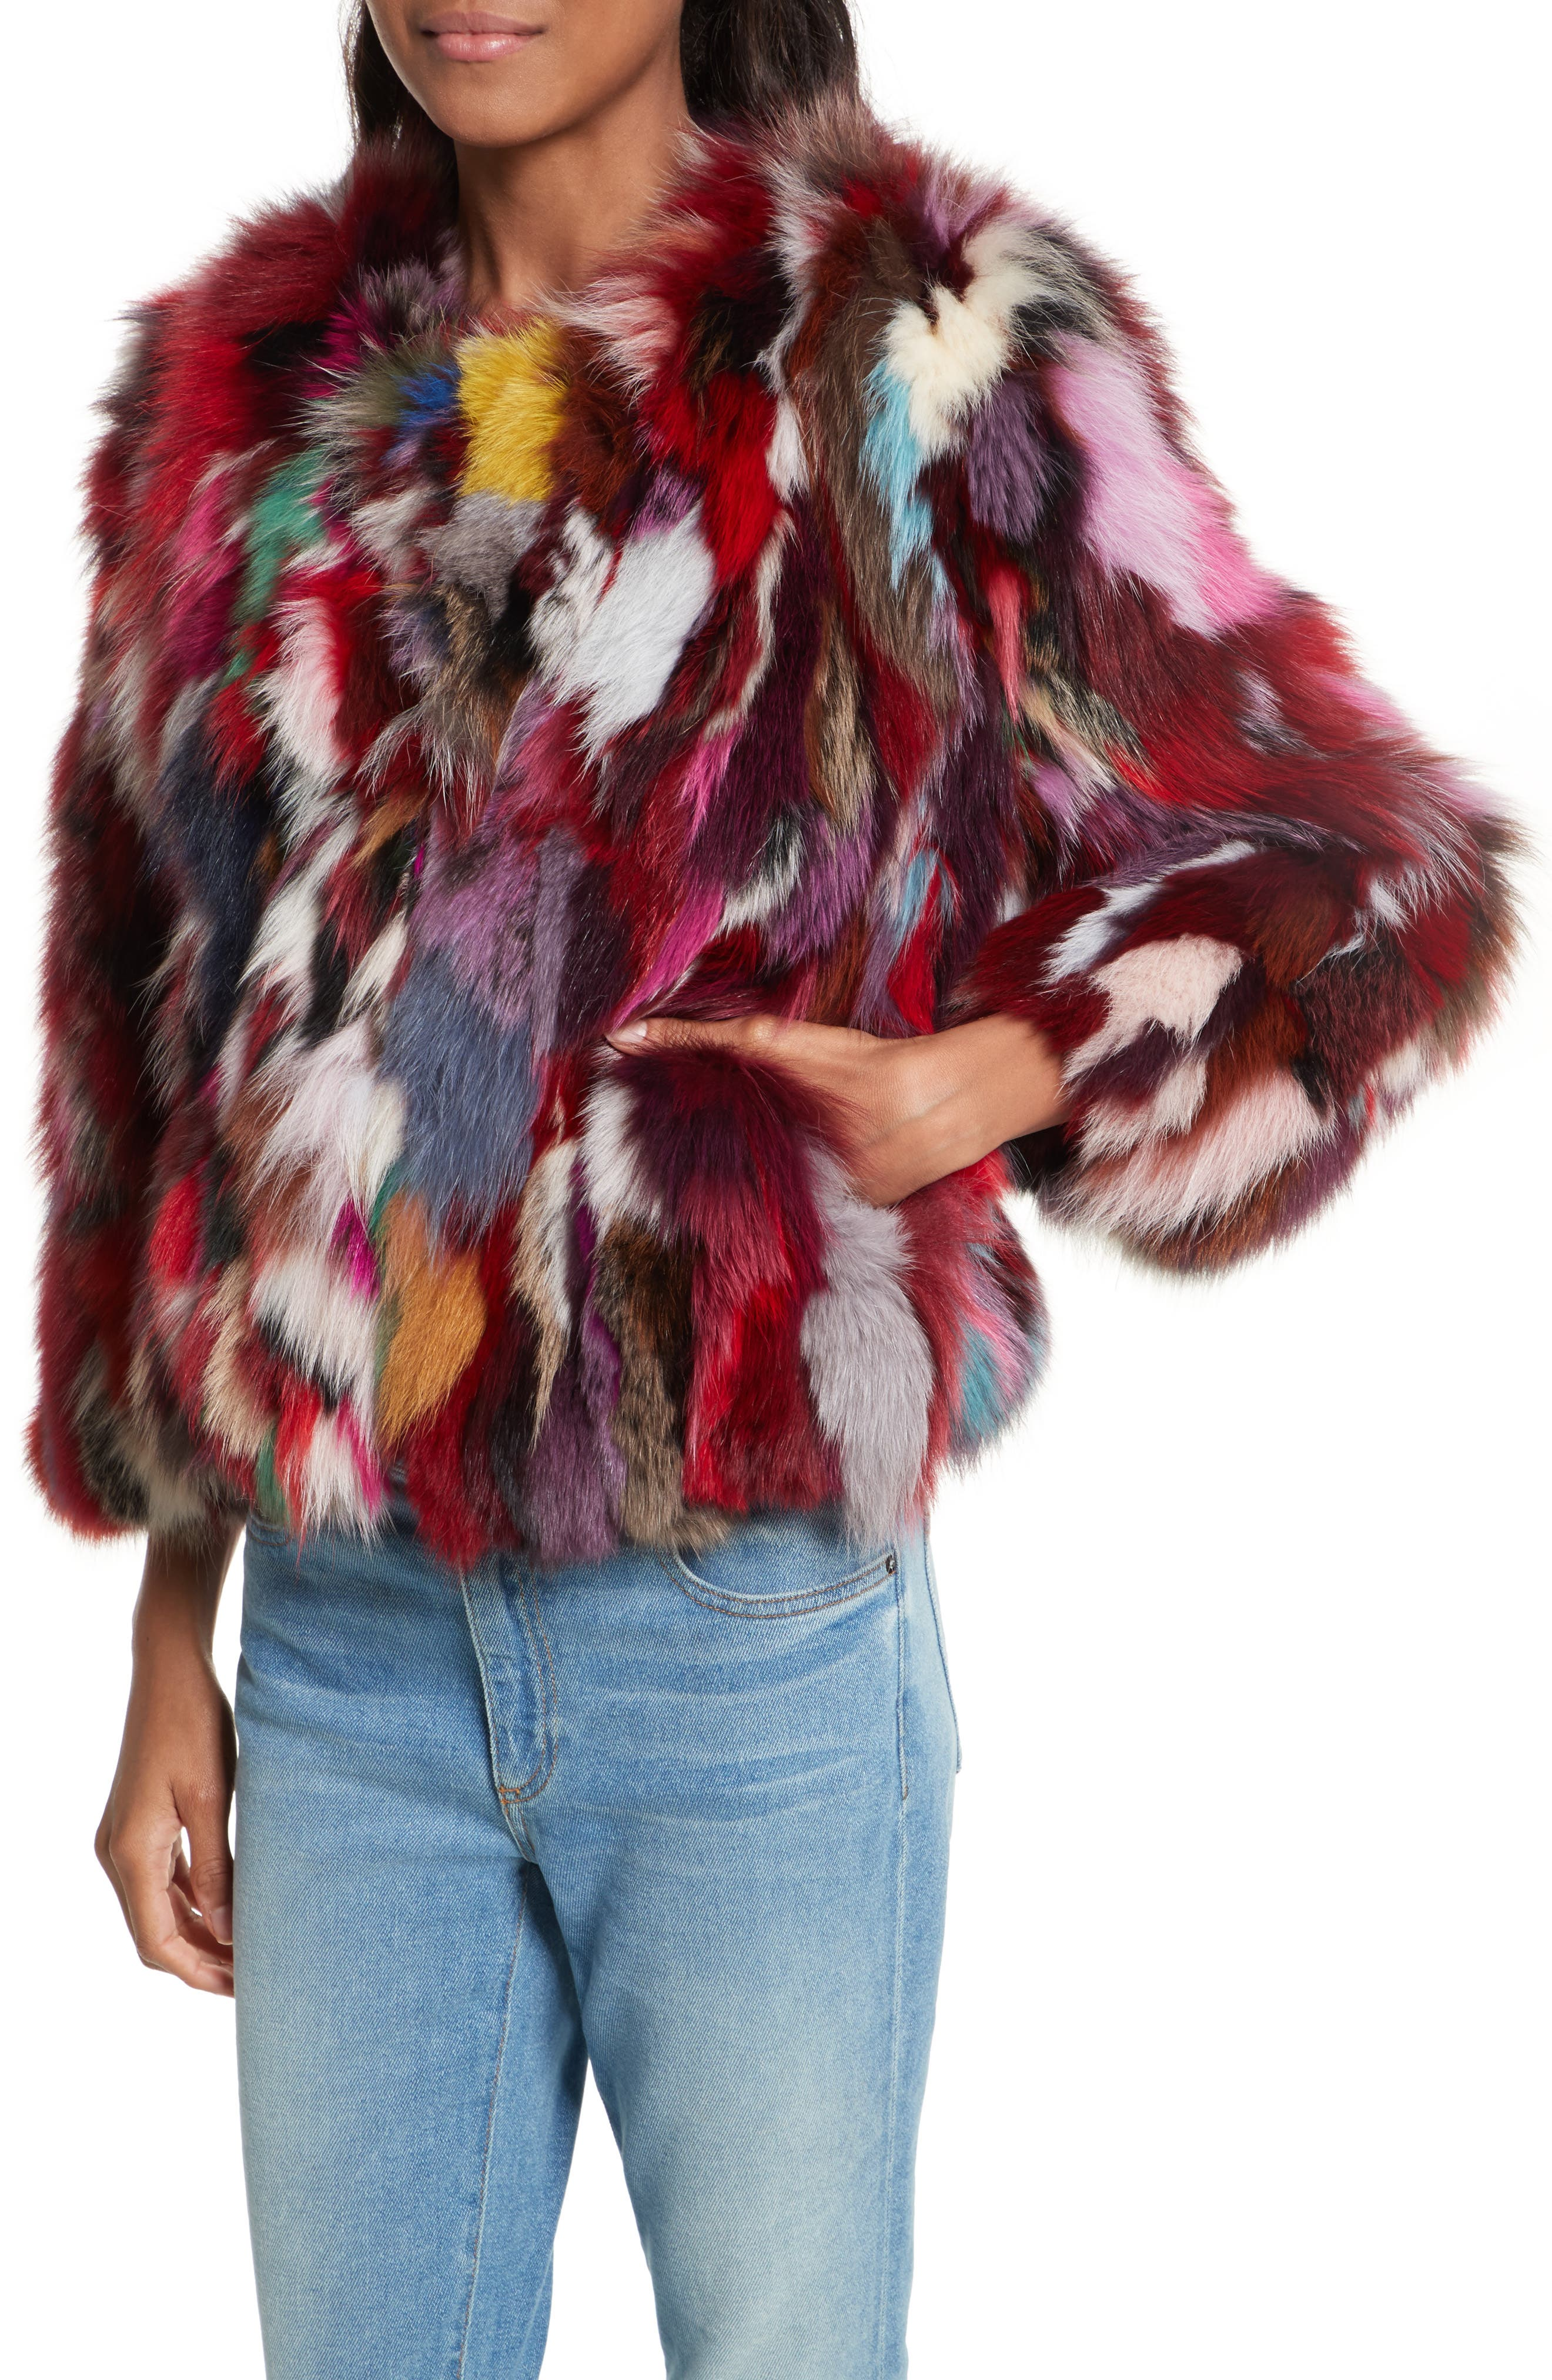 Rachel Genuine Fox Fur Jacket,                             Alternate thumbnail 4, color,                             Multi